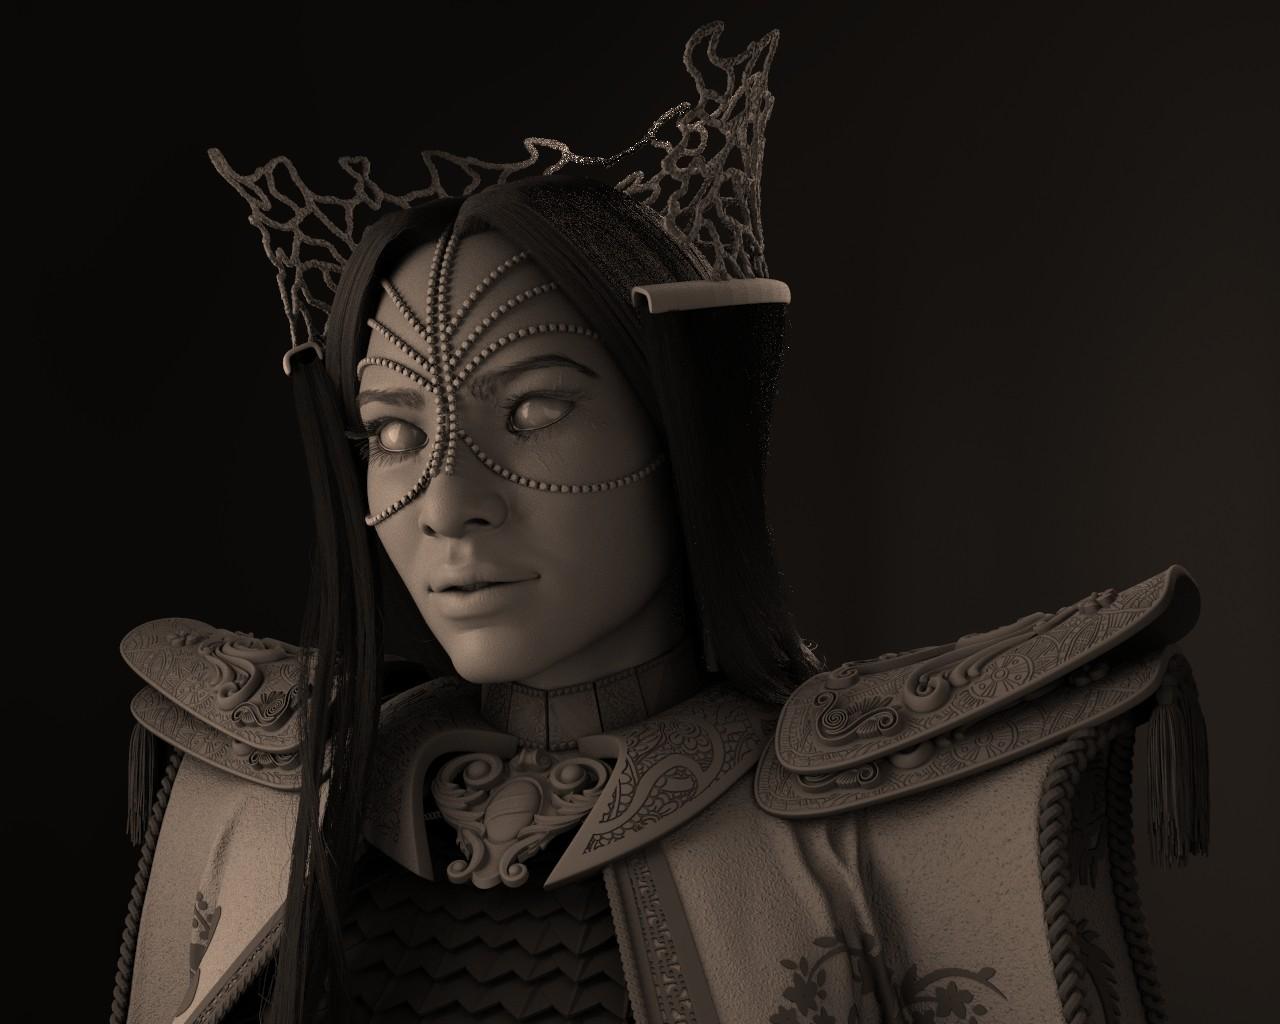 Menimus - The Royal Enchantress: High poly